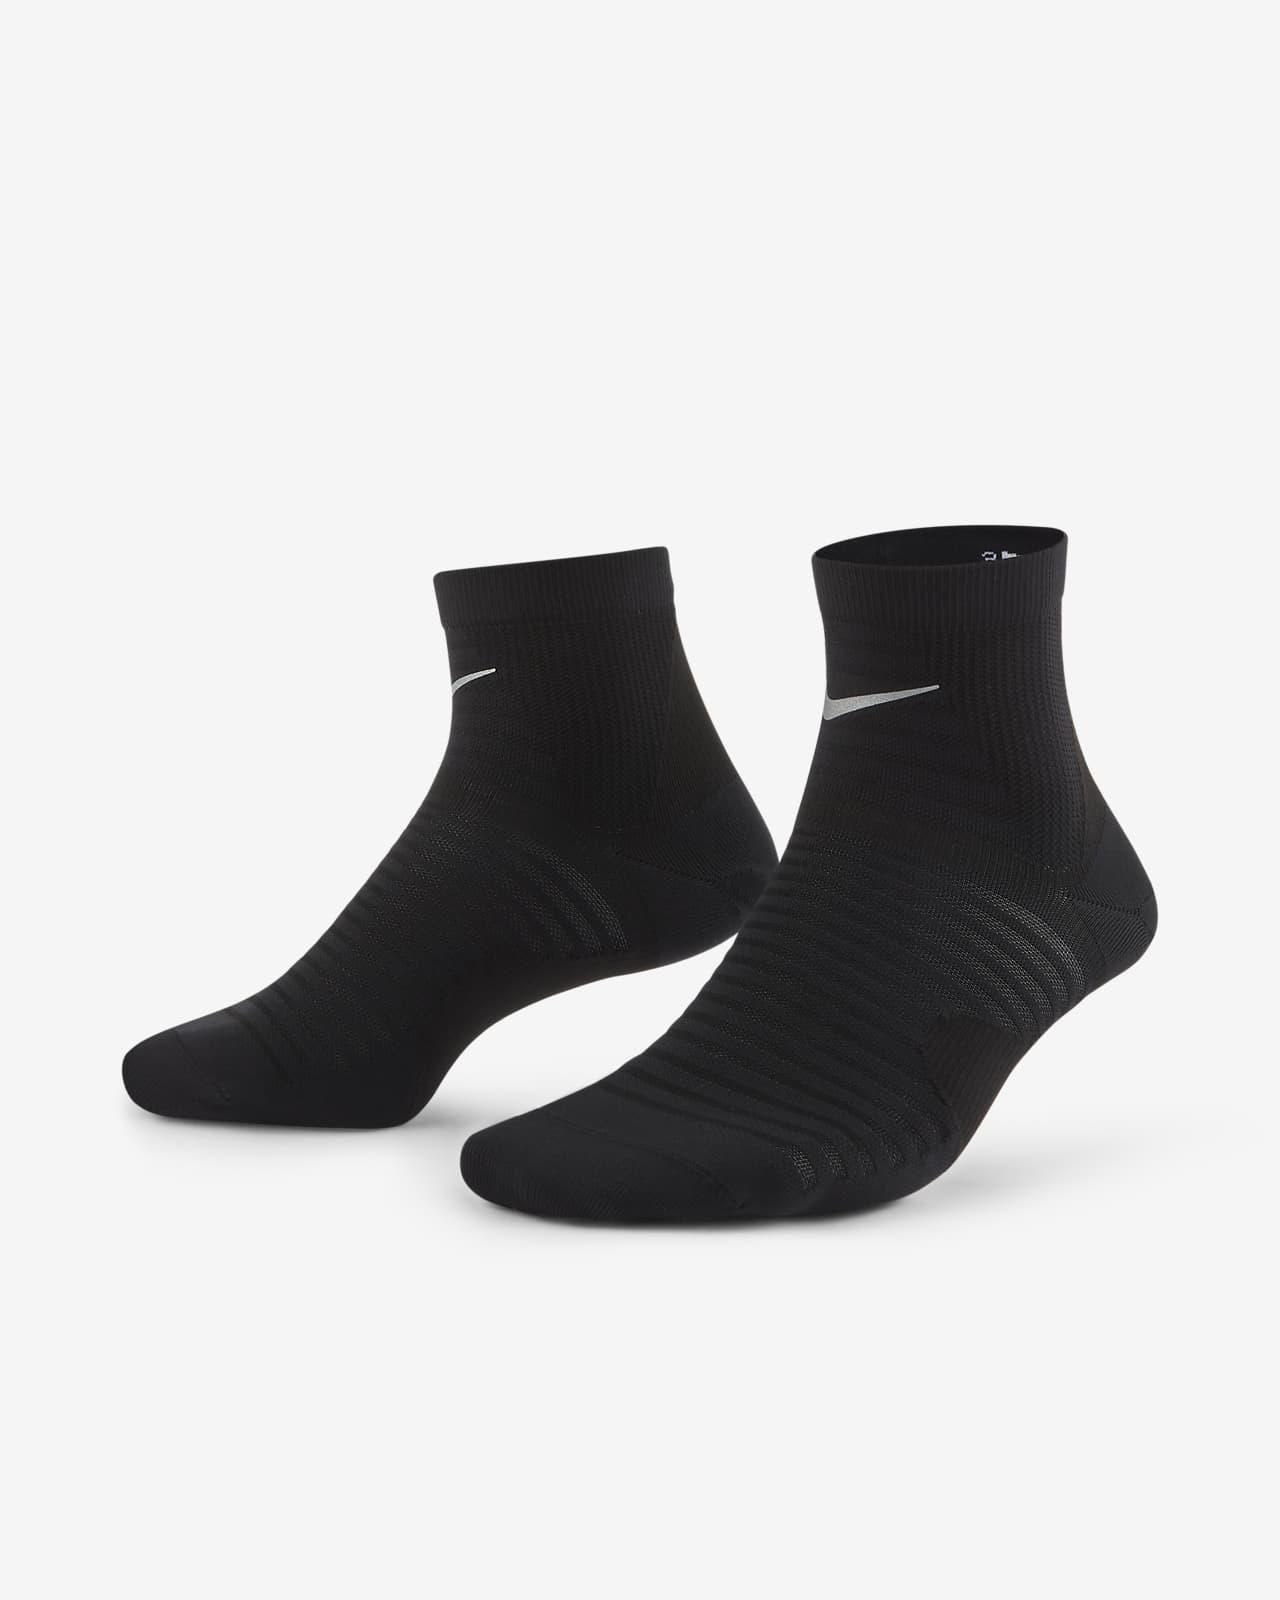 Calze da running alla caviglia Nike Spark Lightweight